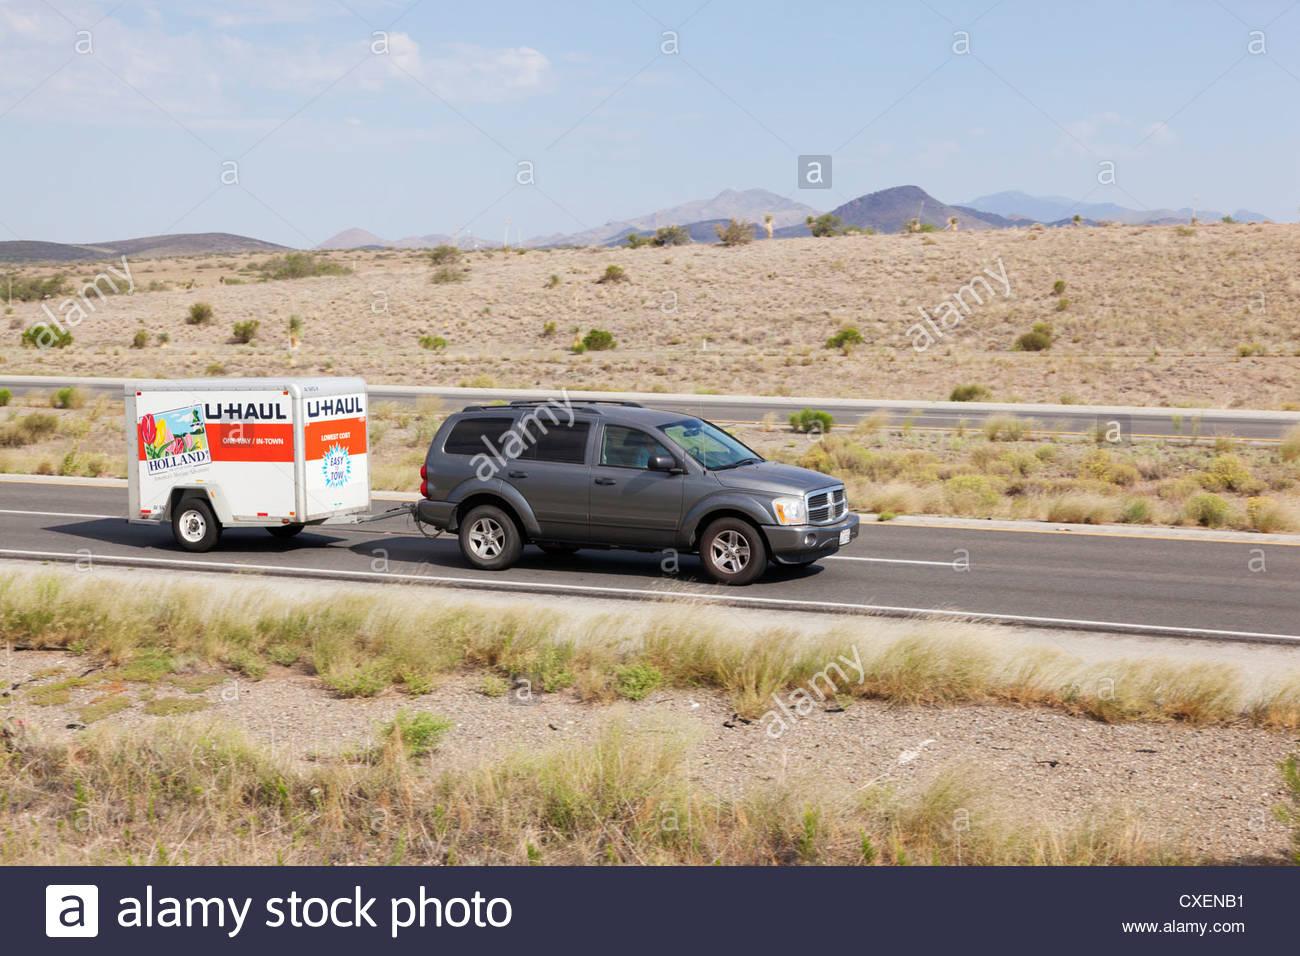 Suv Towing U Haul Trailer I Southeast Arizona Driver Visible